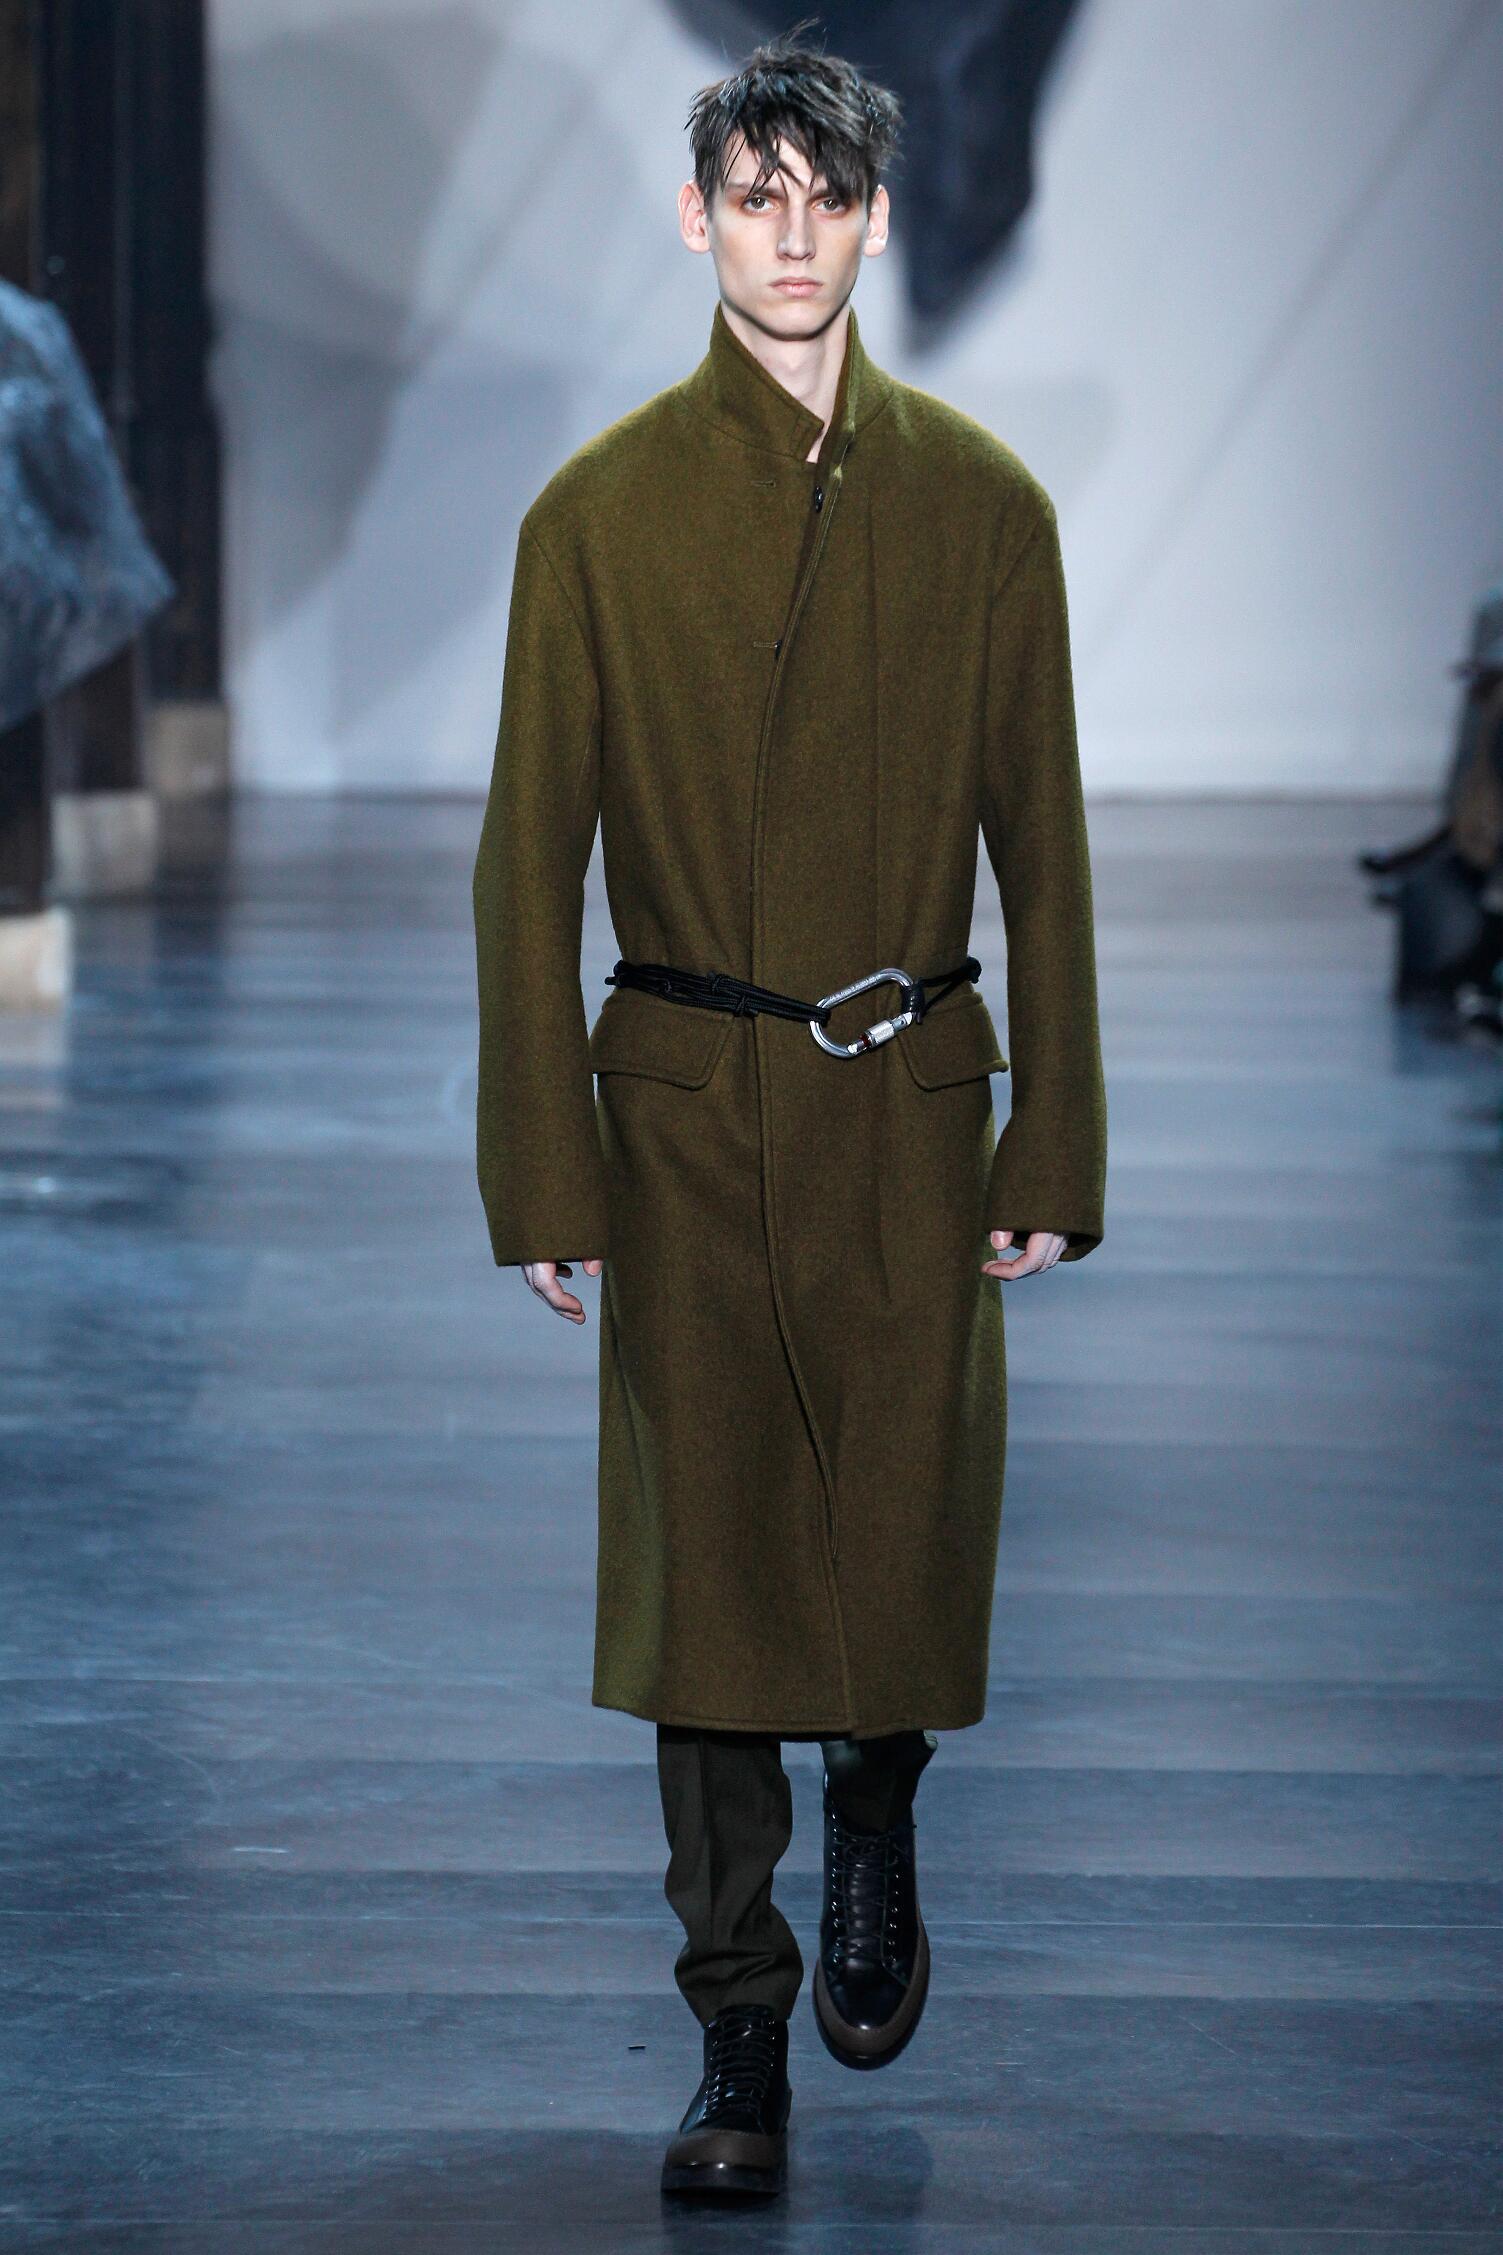 2016 Fall Fashion Man 3.1 Phillip Lim Collection